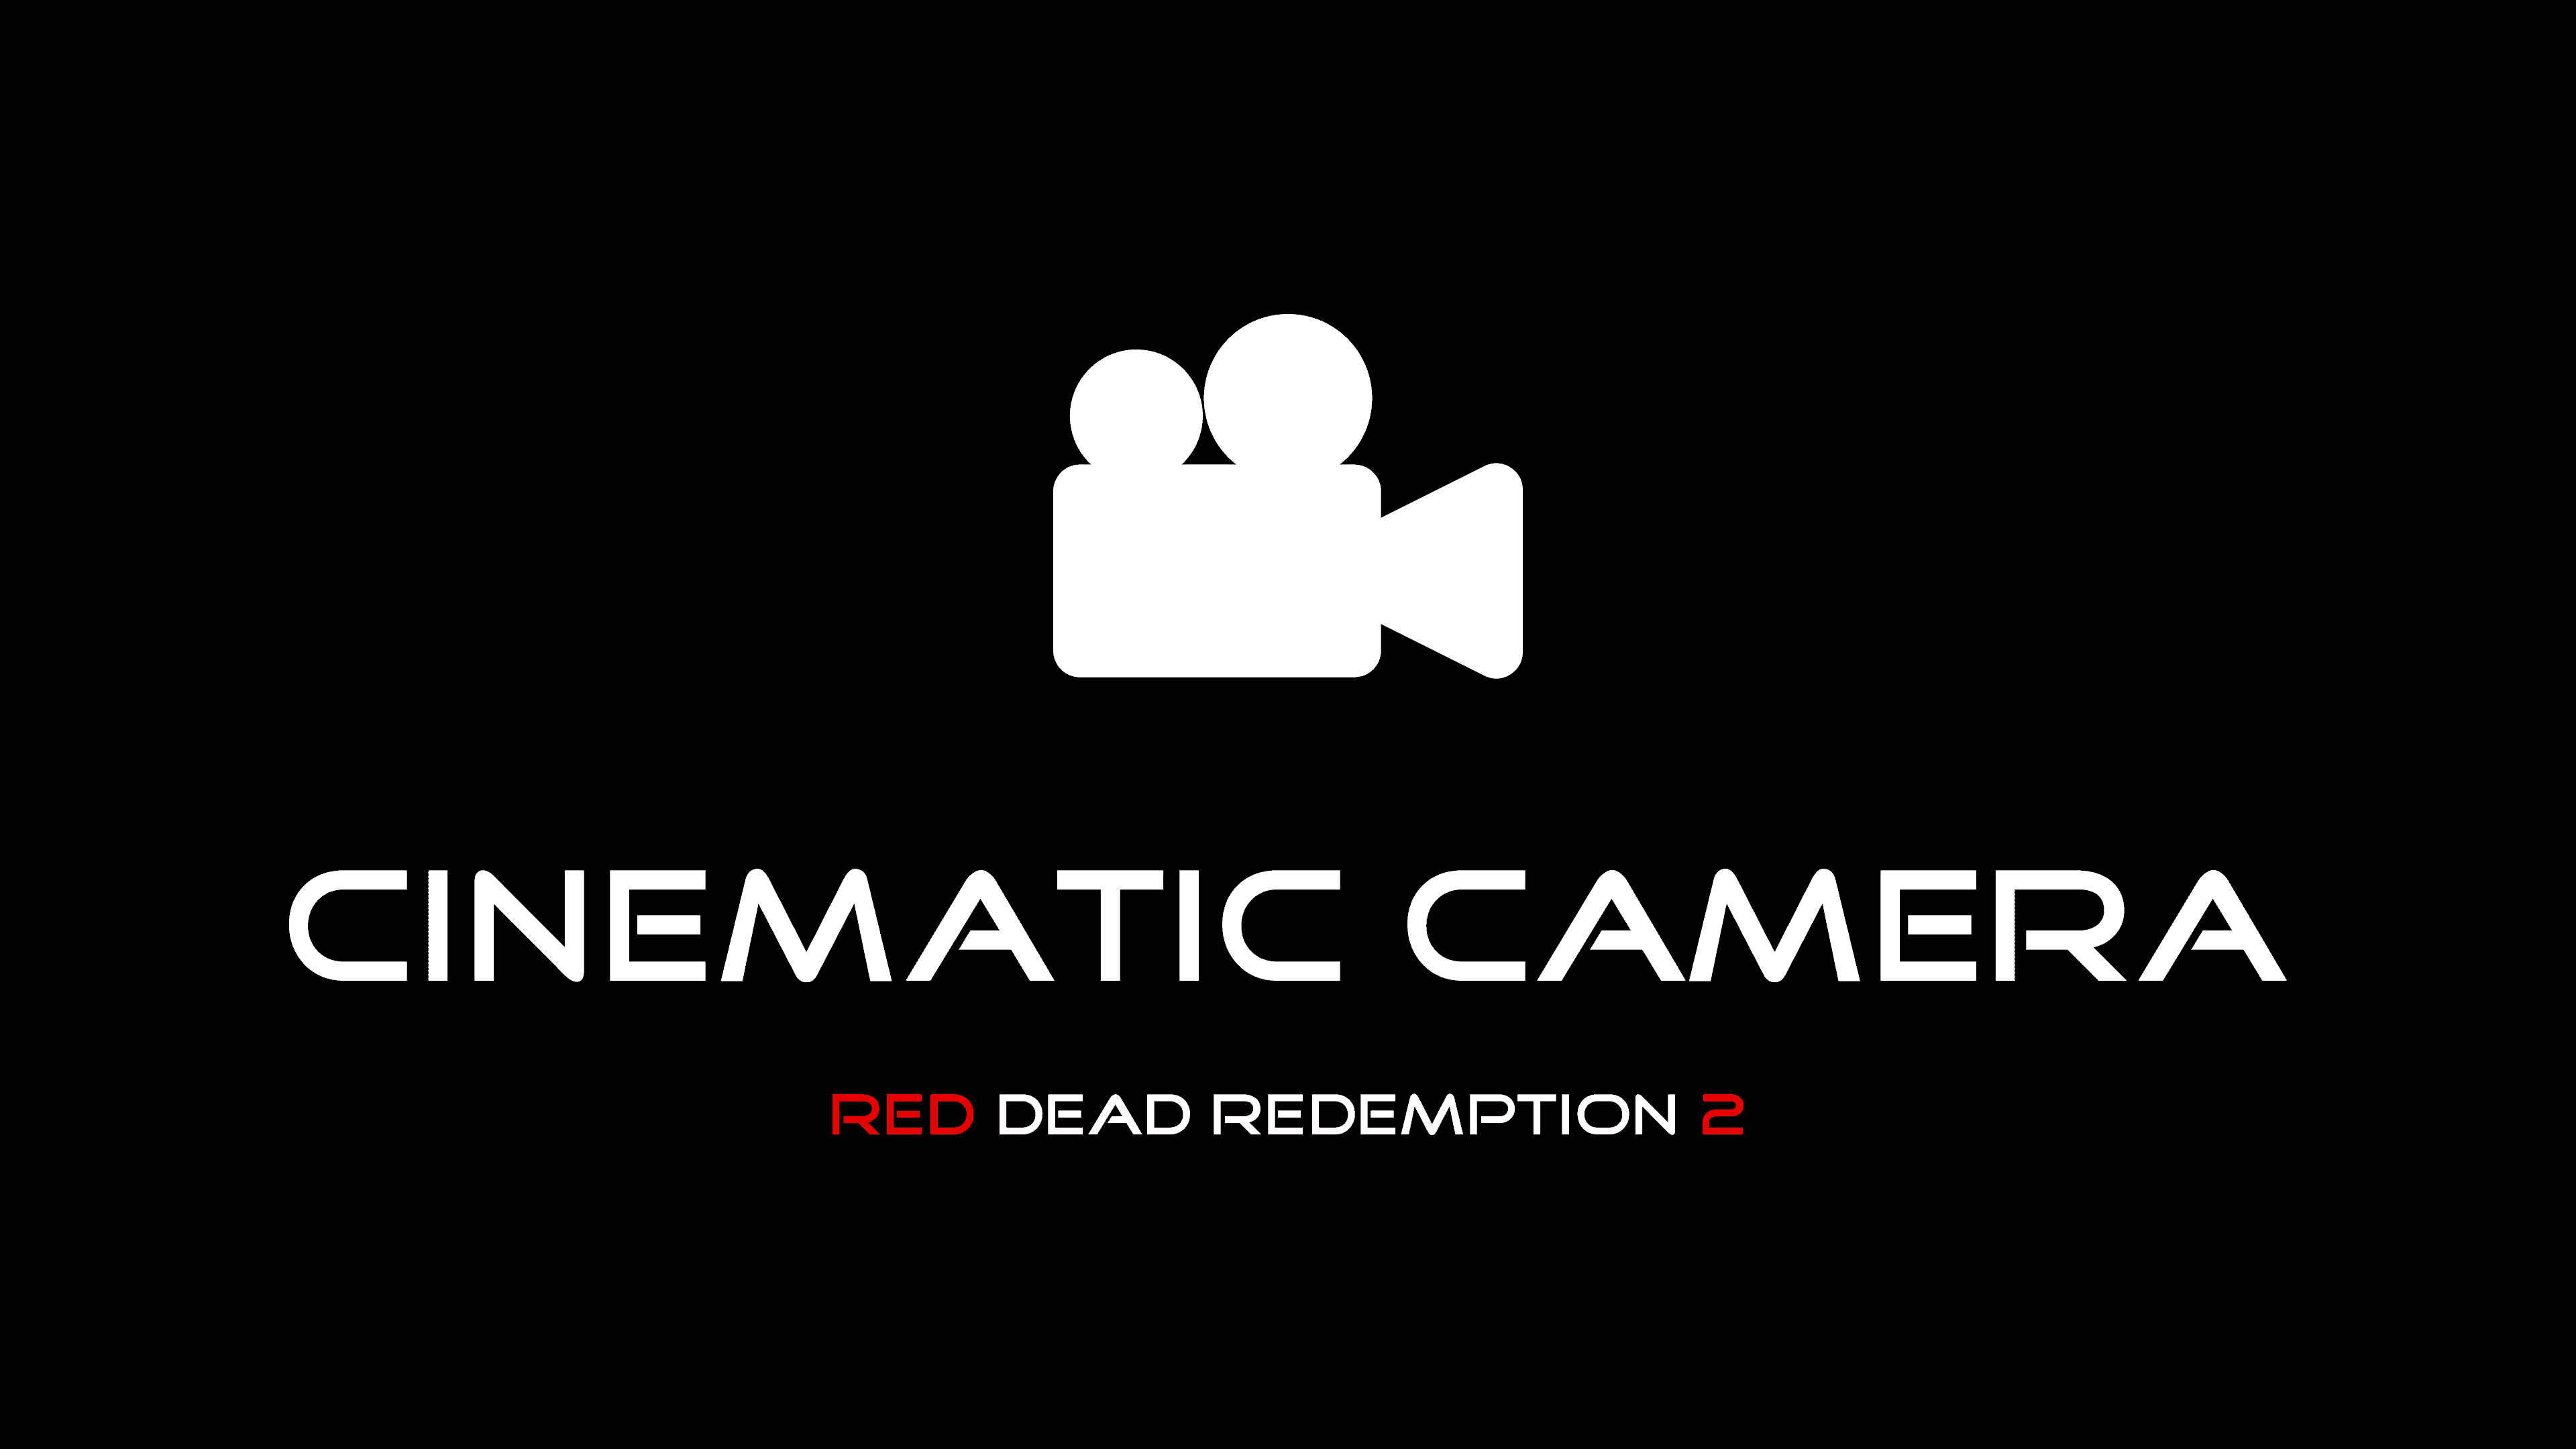 RDR2 - Cinematic Camera